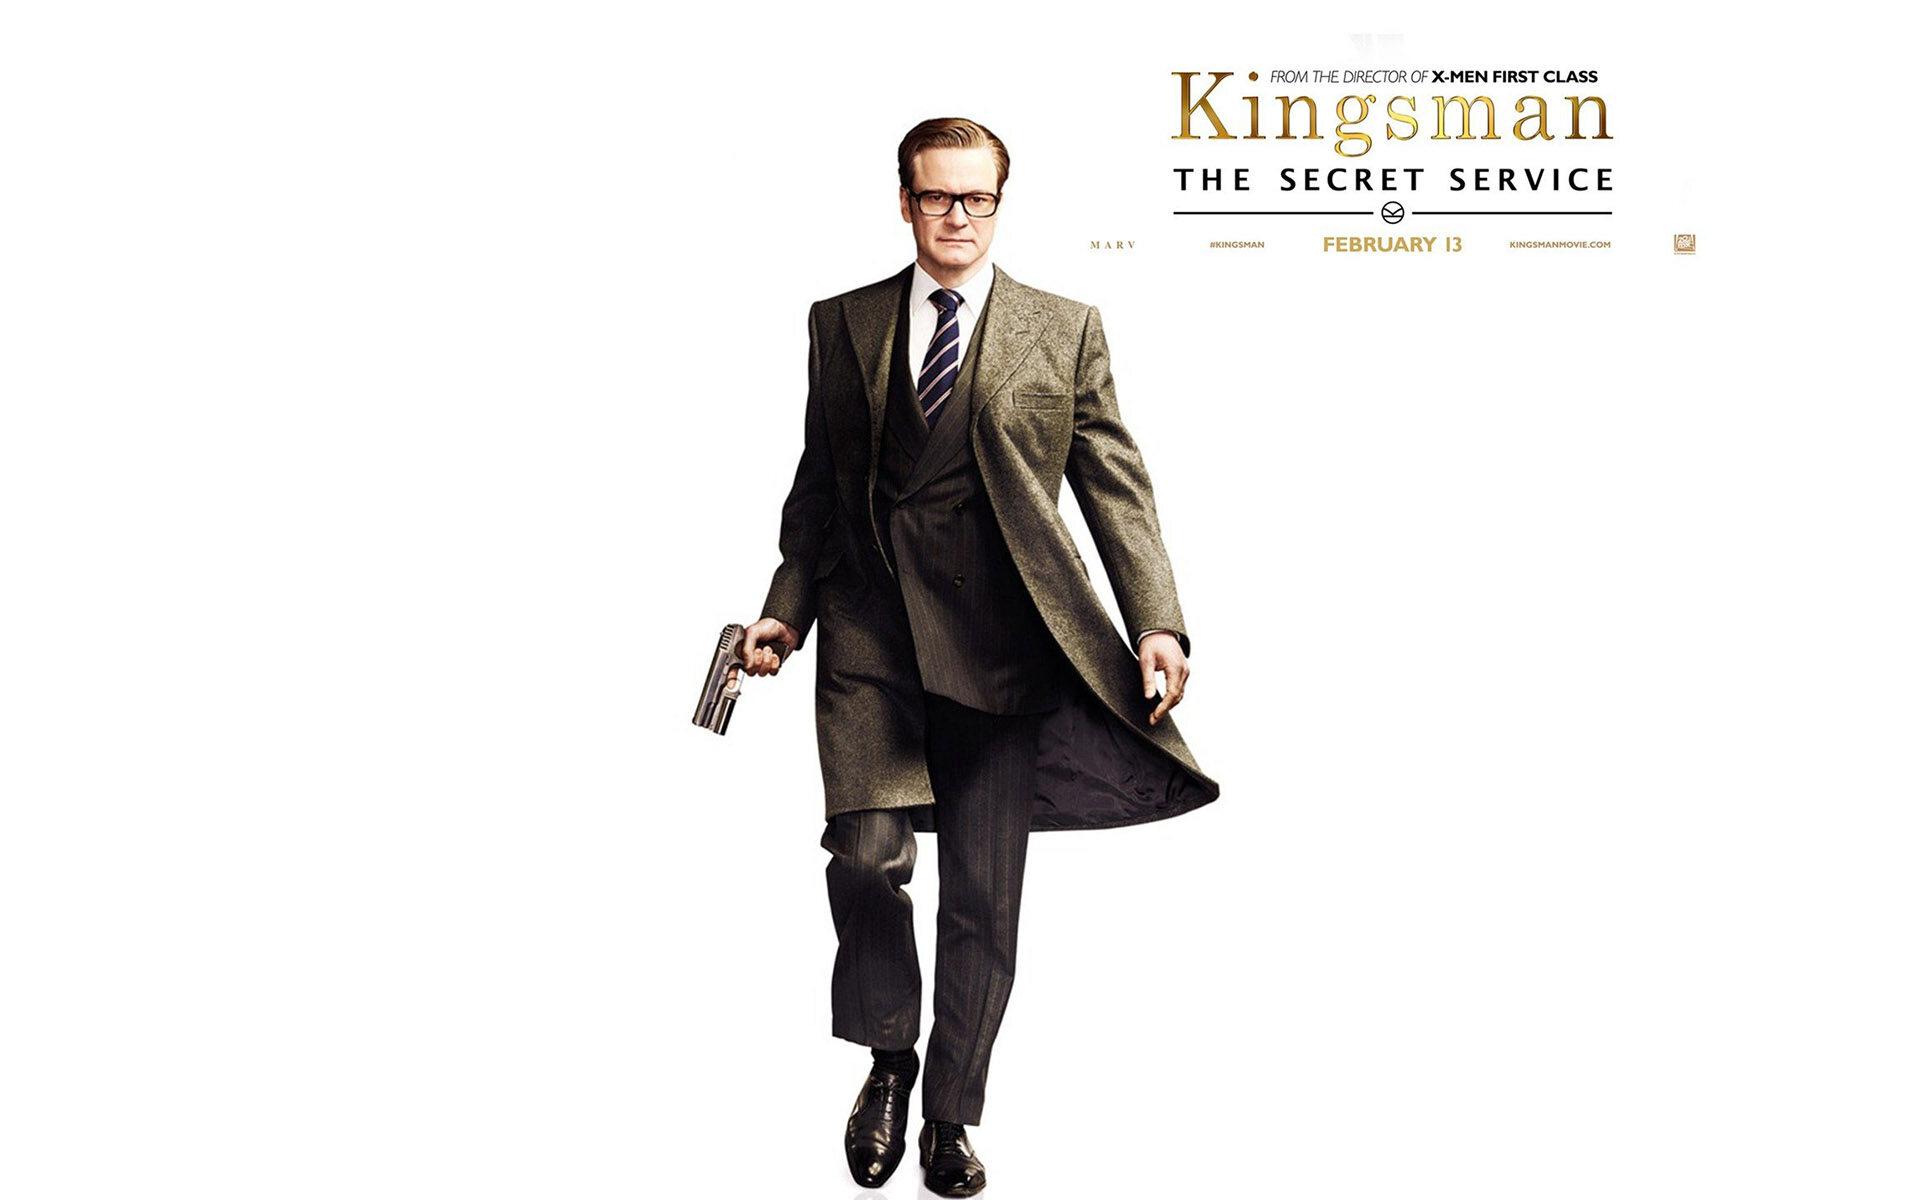 Kingsman Film Quotes